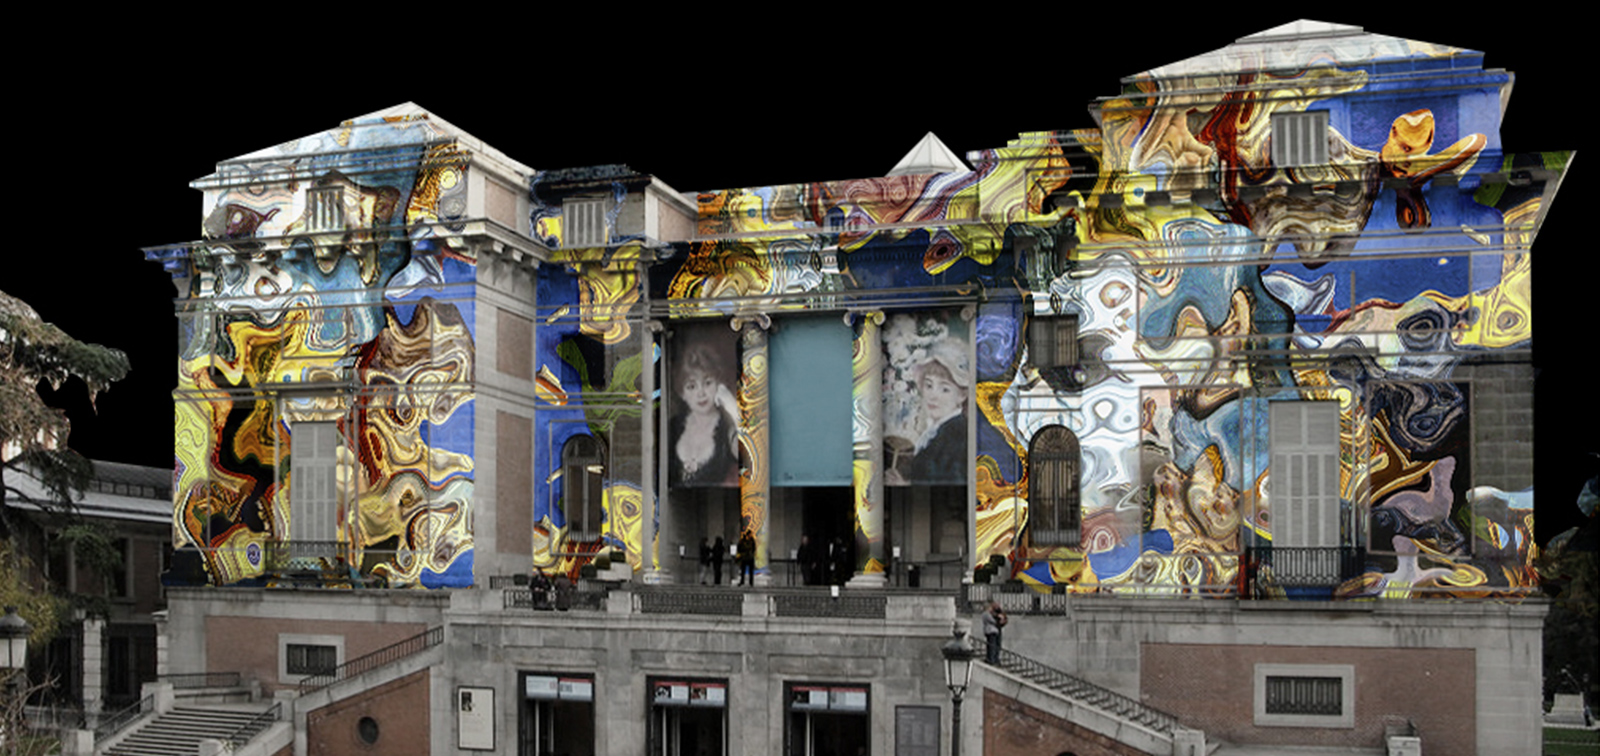 Amalgama el Prado. Videomapping en la fachada de Goya